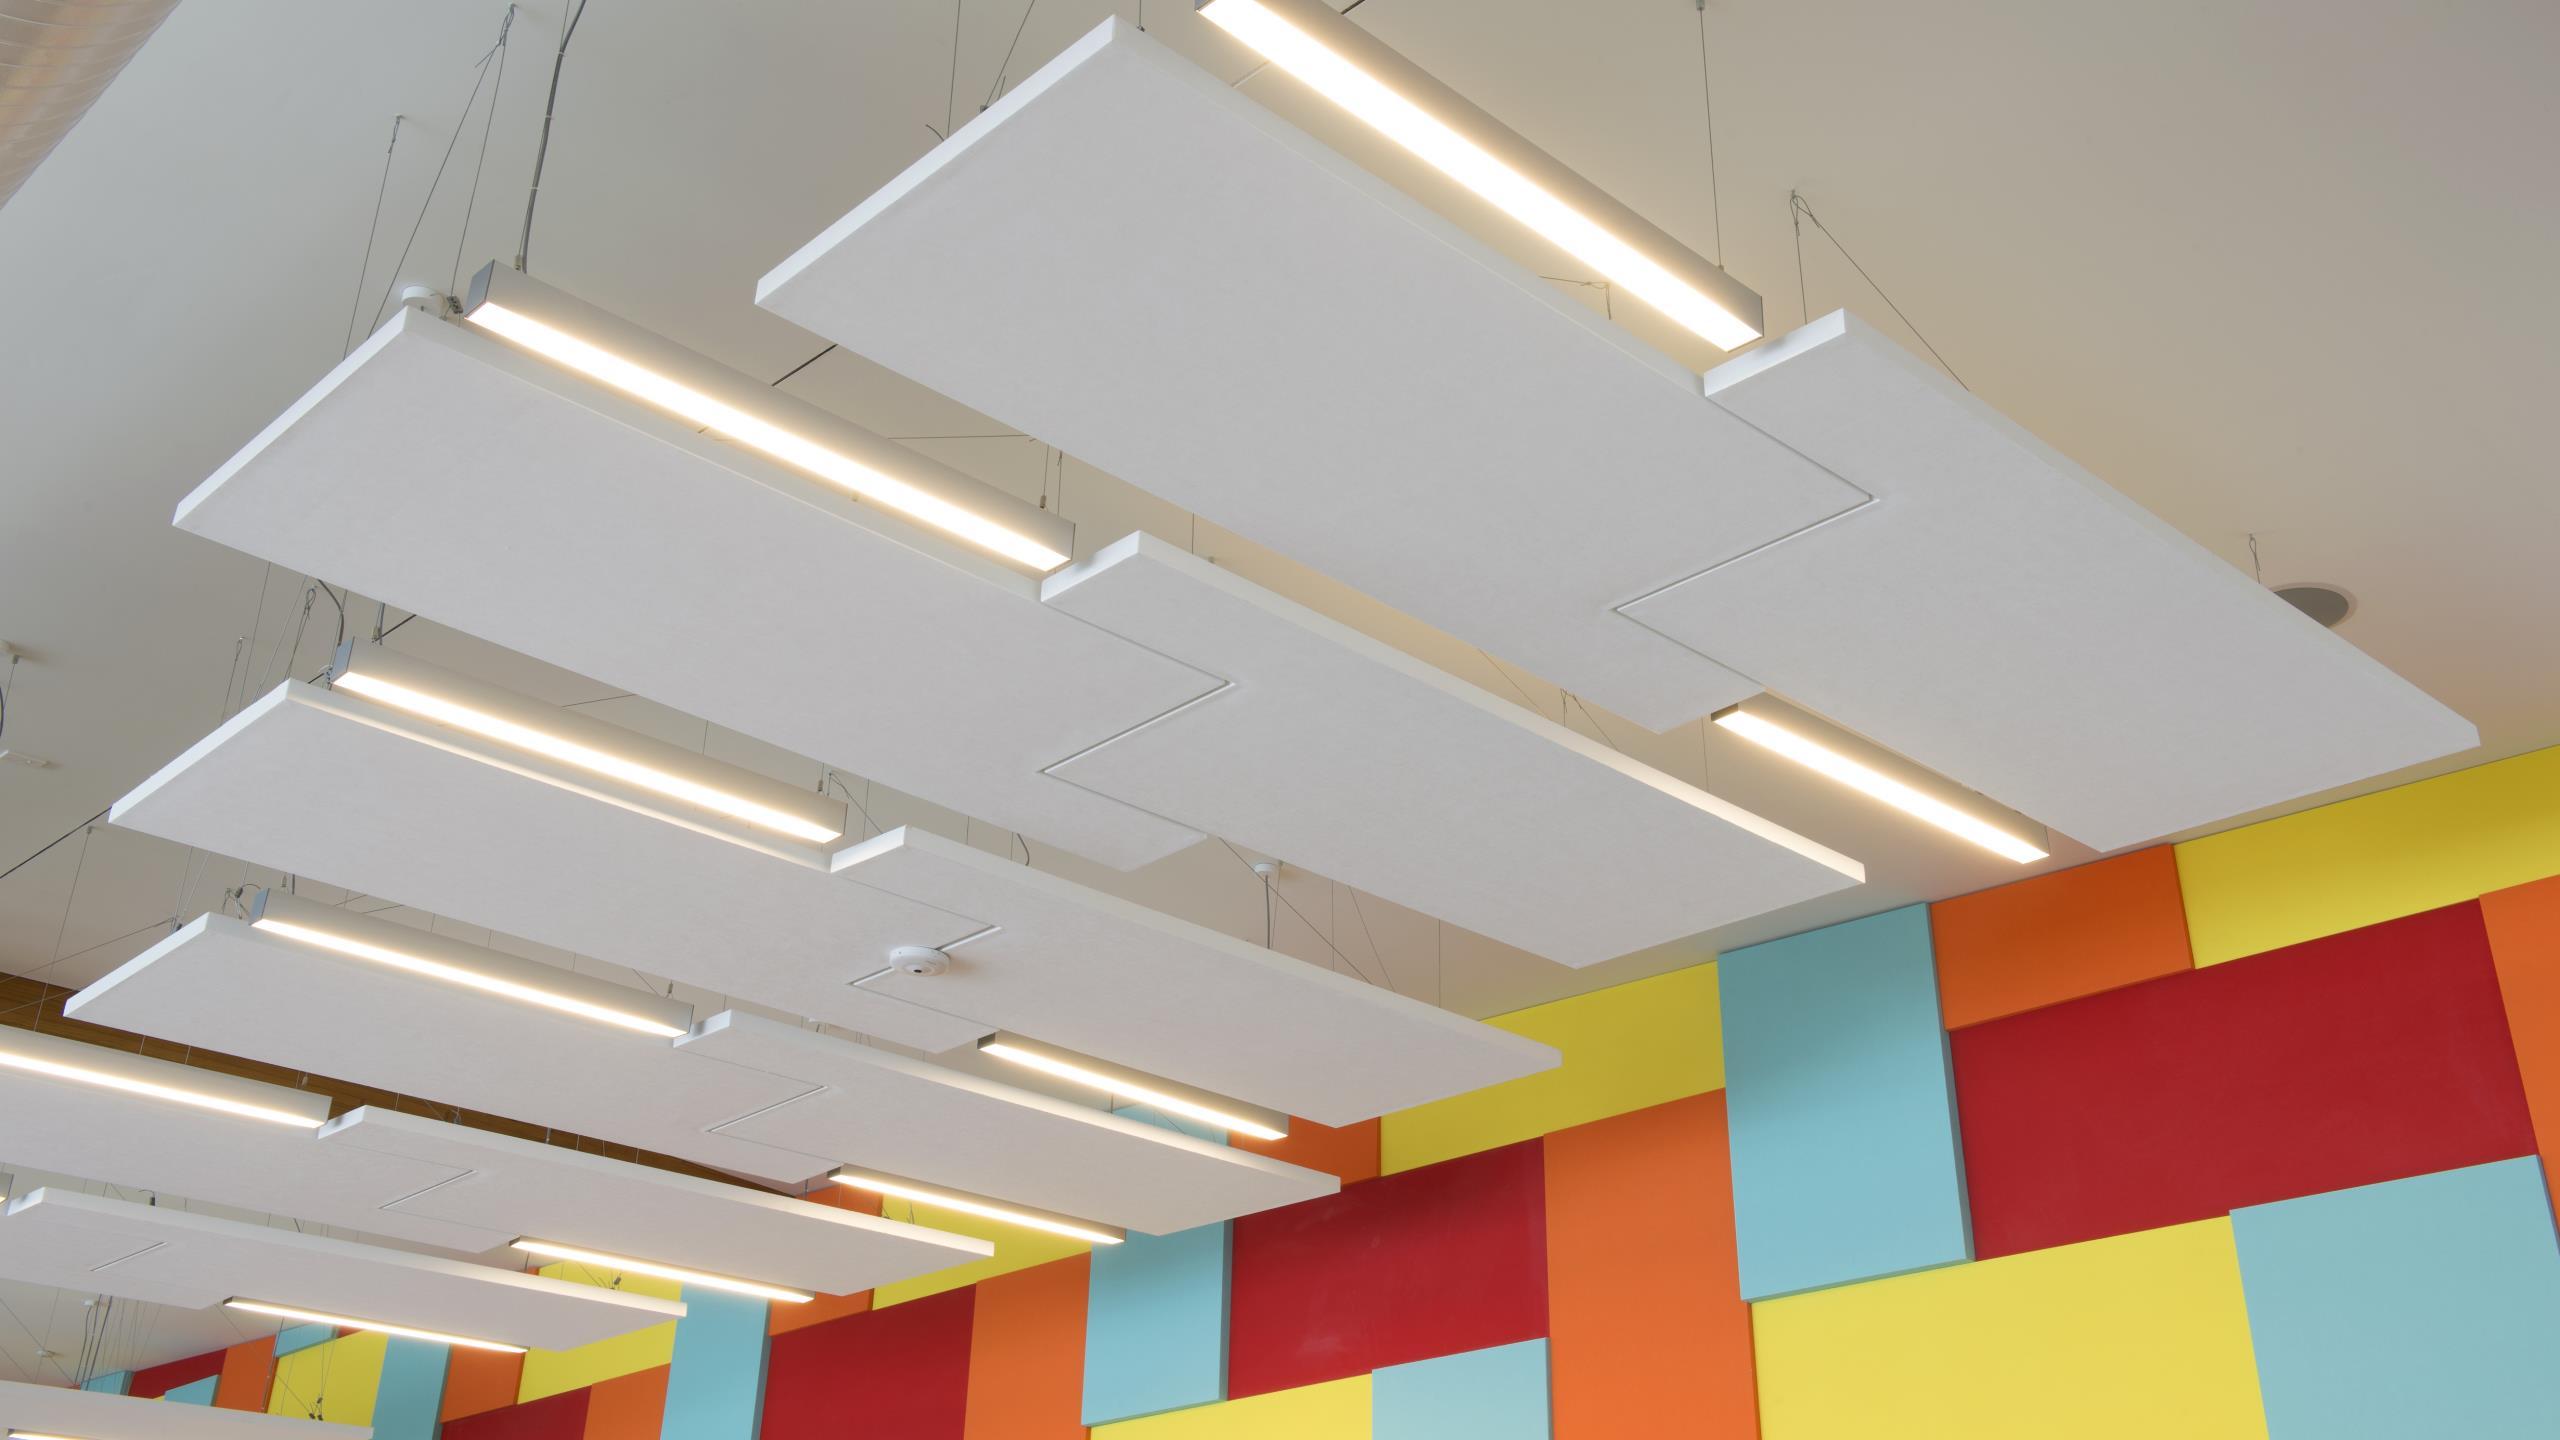 Otahuhu Recreational Precinct - Library interlocking Cloud panels